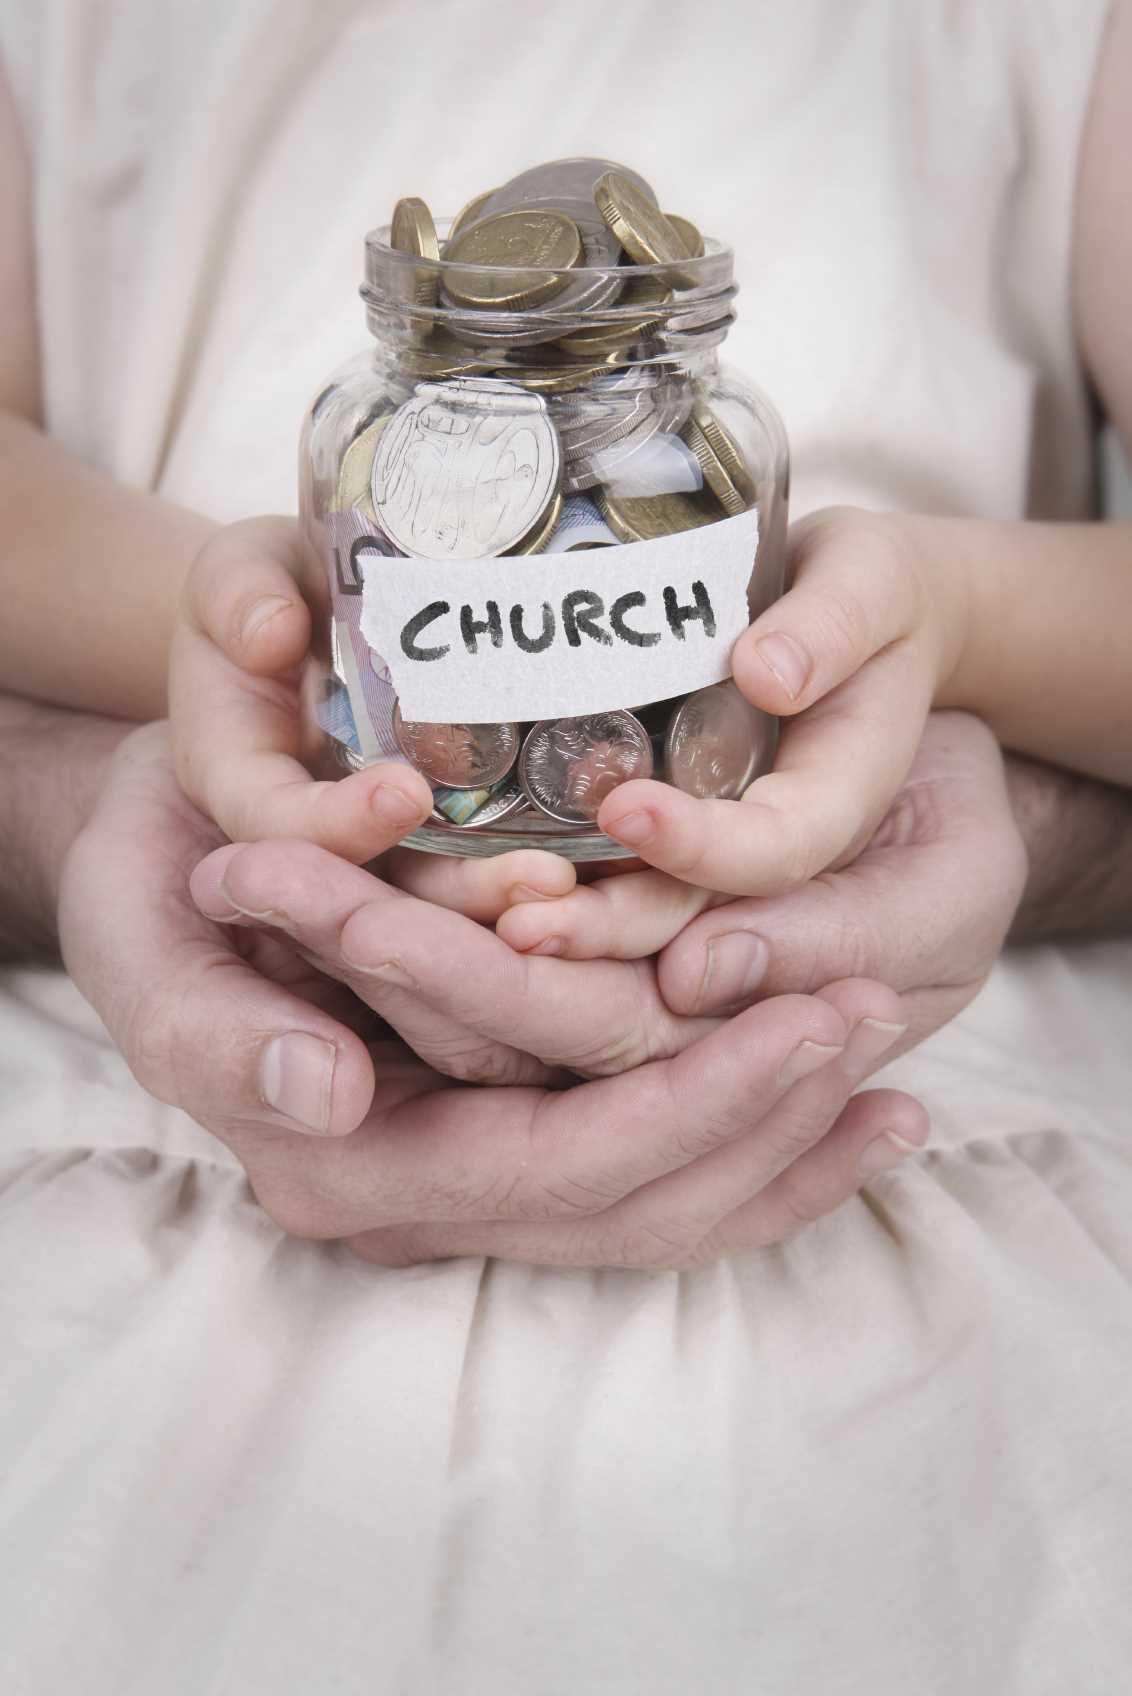 Grants for Faith-Based Organizations